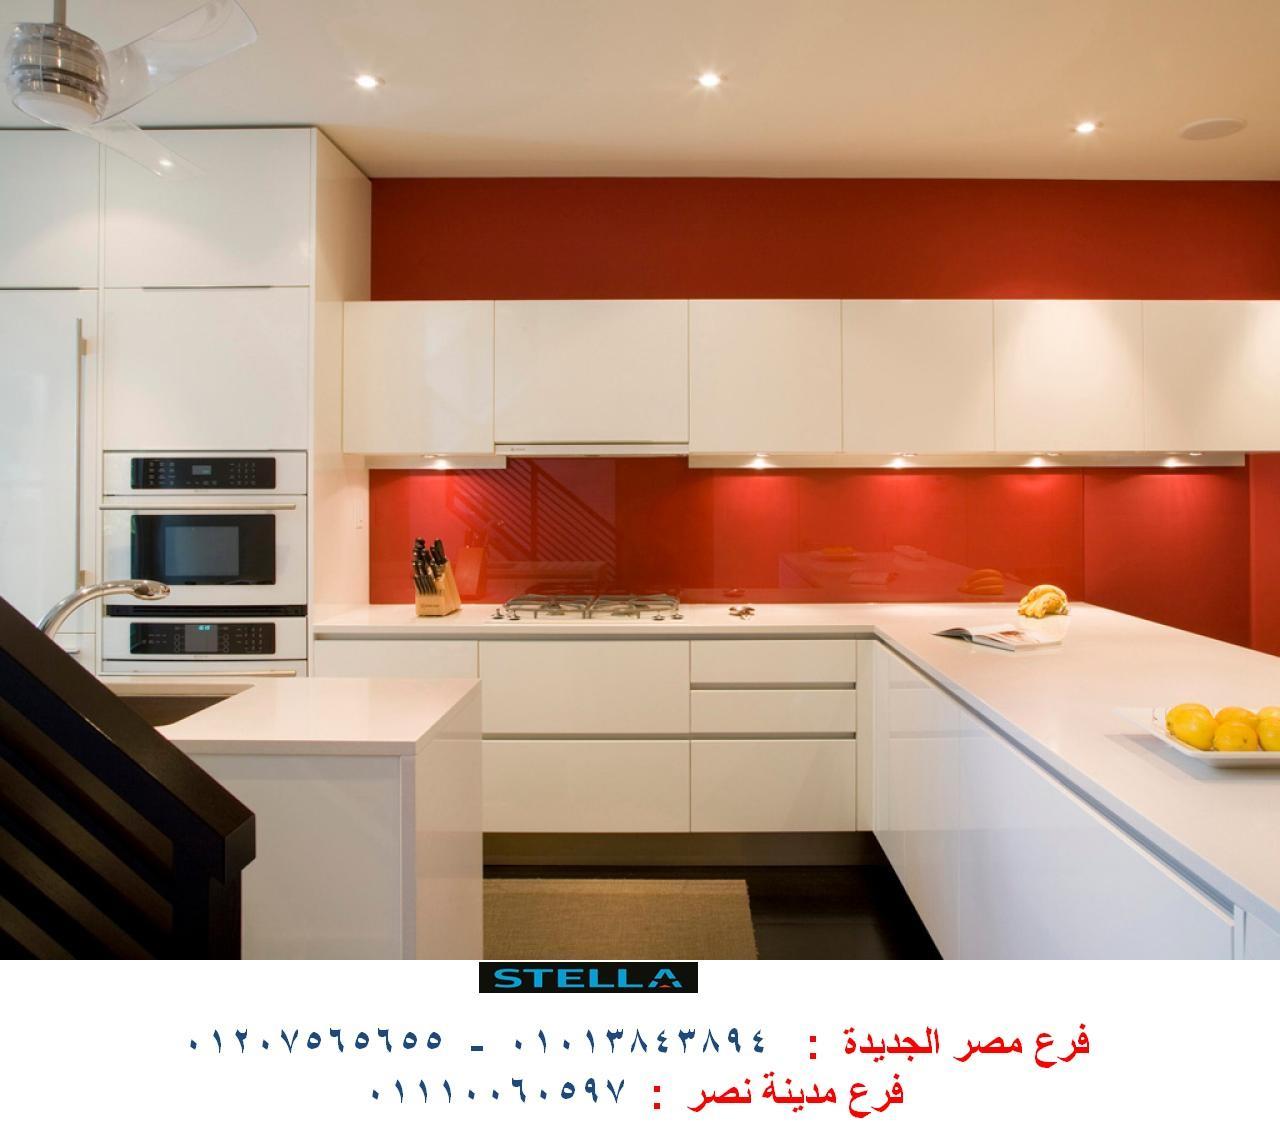 مطابخ اكريليك بافضل سعر فى مصر    01207565655 200037230